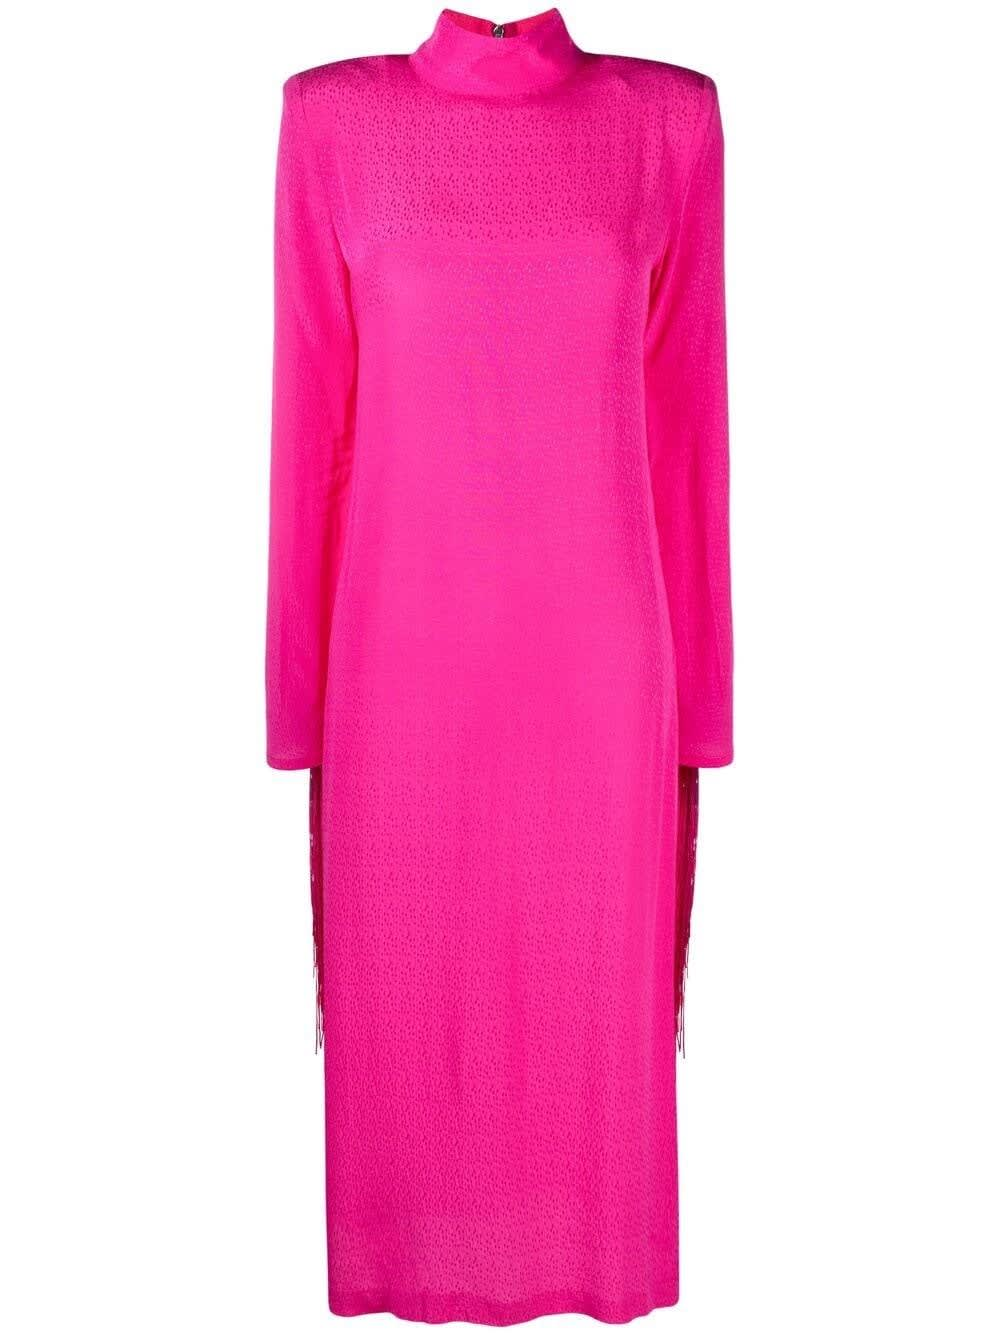 Rotate Birger Christensen Dresses REBA PINK DRESS WITH FRINGES